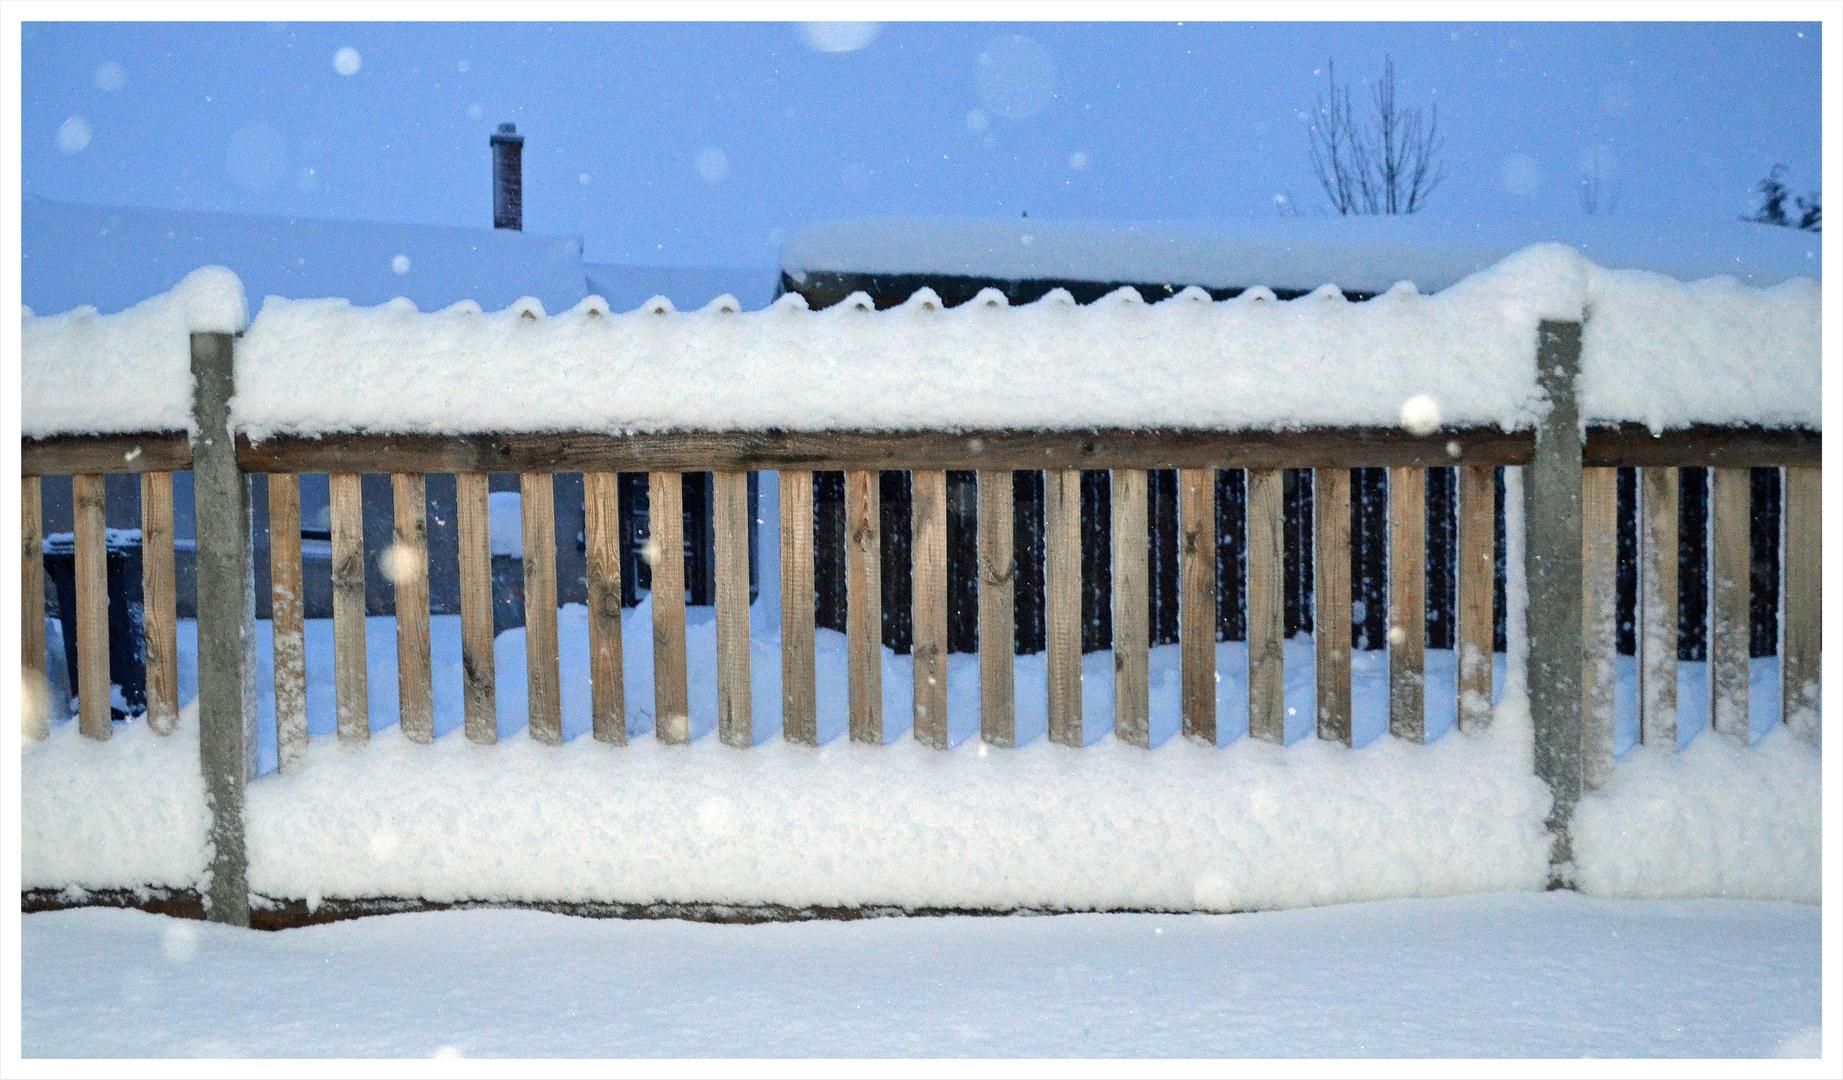 Schneewellensynphoniewalzer